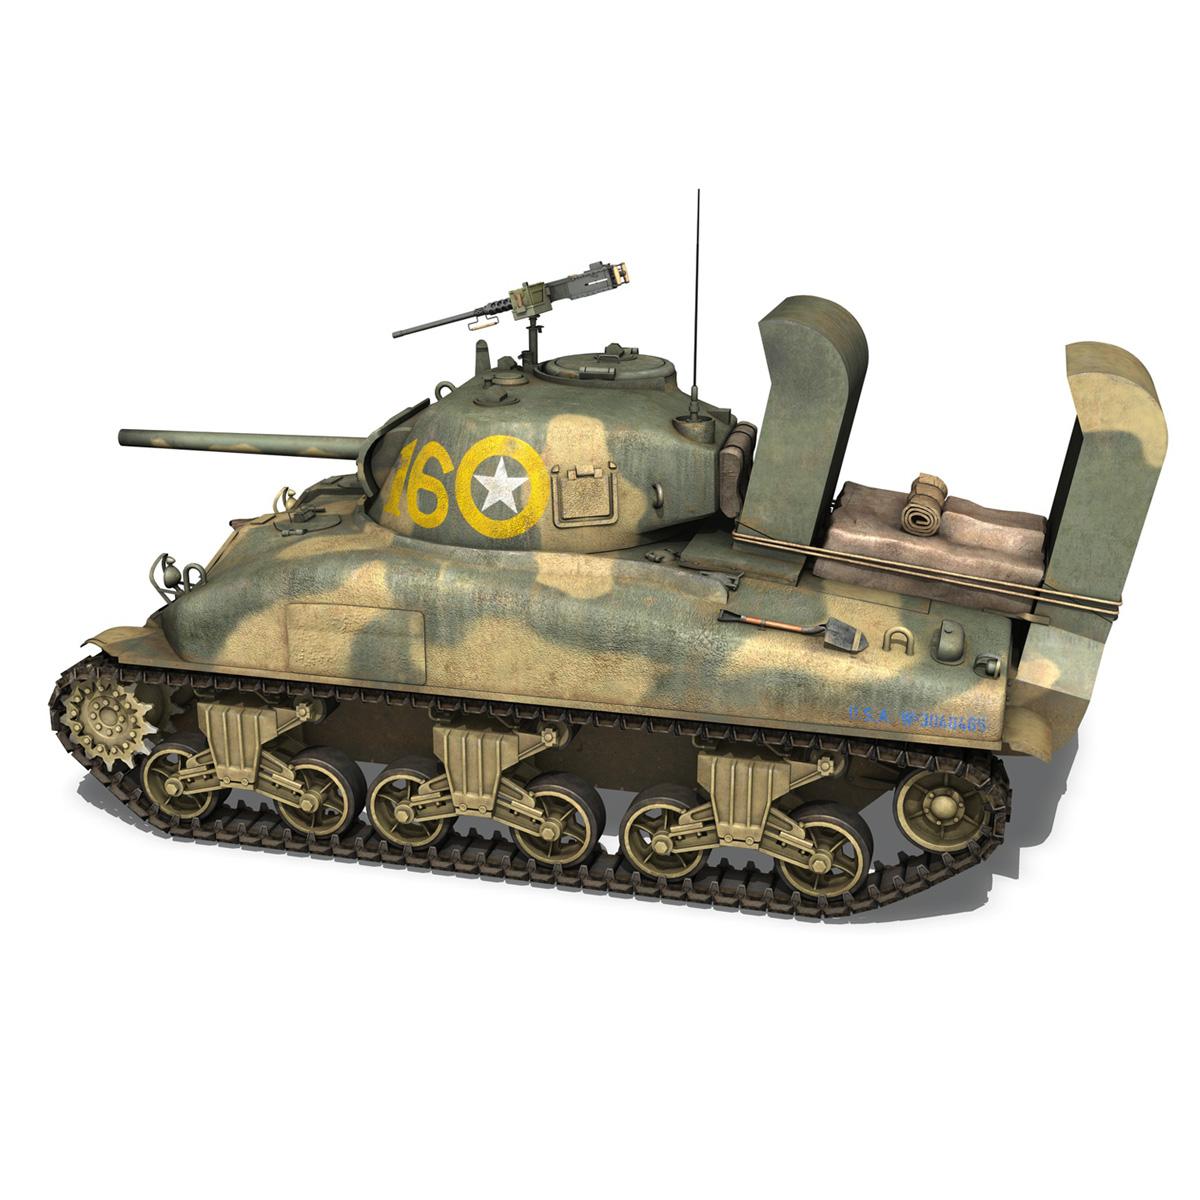 M4A1 Sherman - 16 3d model 3ds fbx c4d lwo lws lw obj 273053